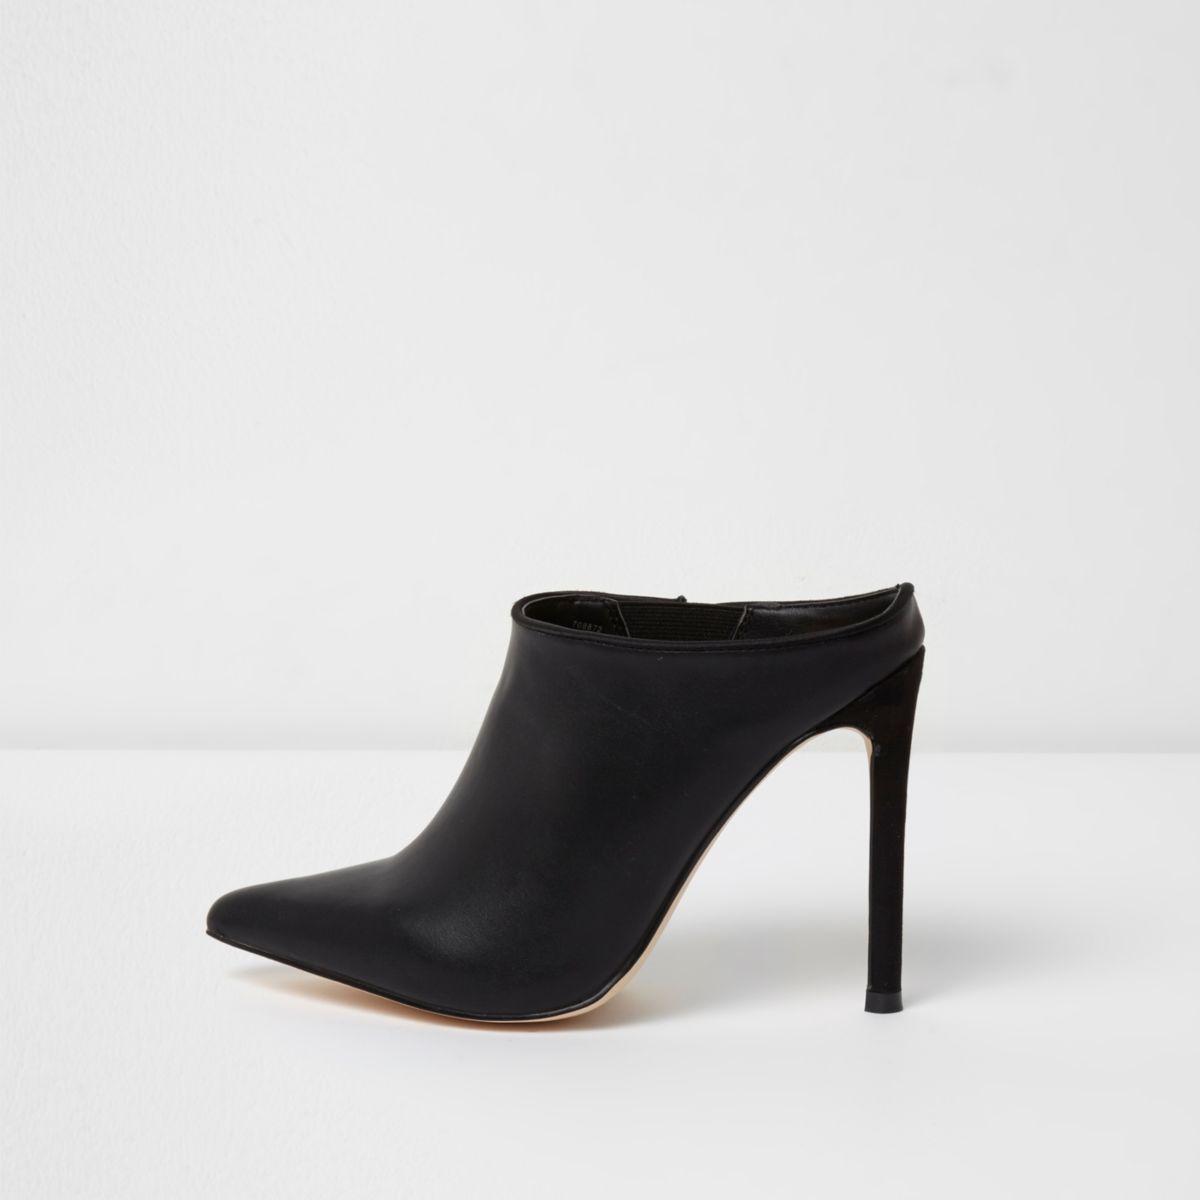 Black pointed toe stiletto mules